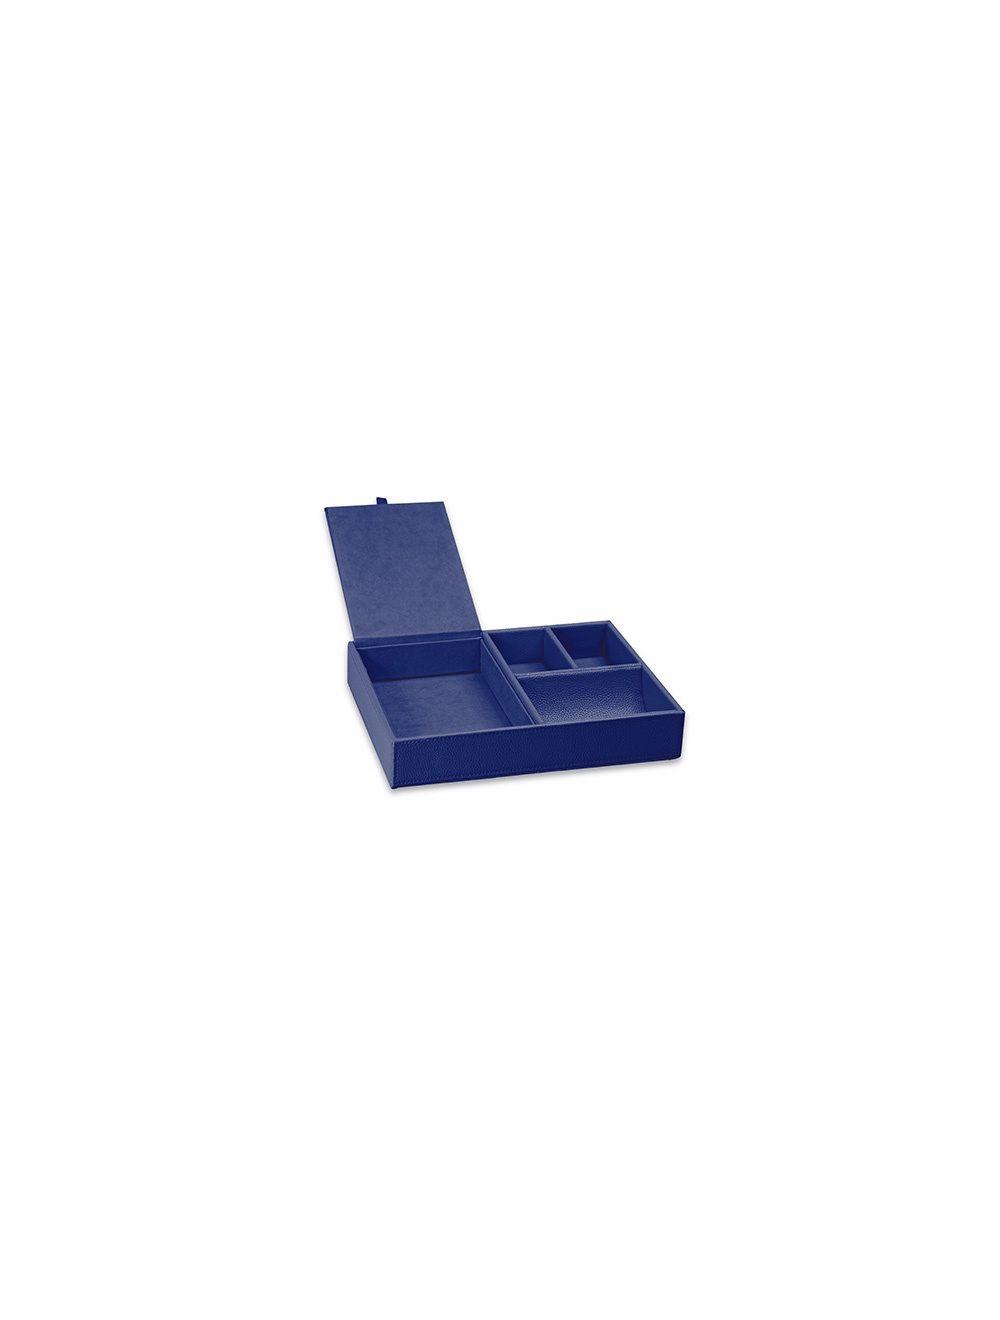 Organizer da scrivania - Blu Oceano